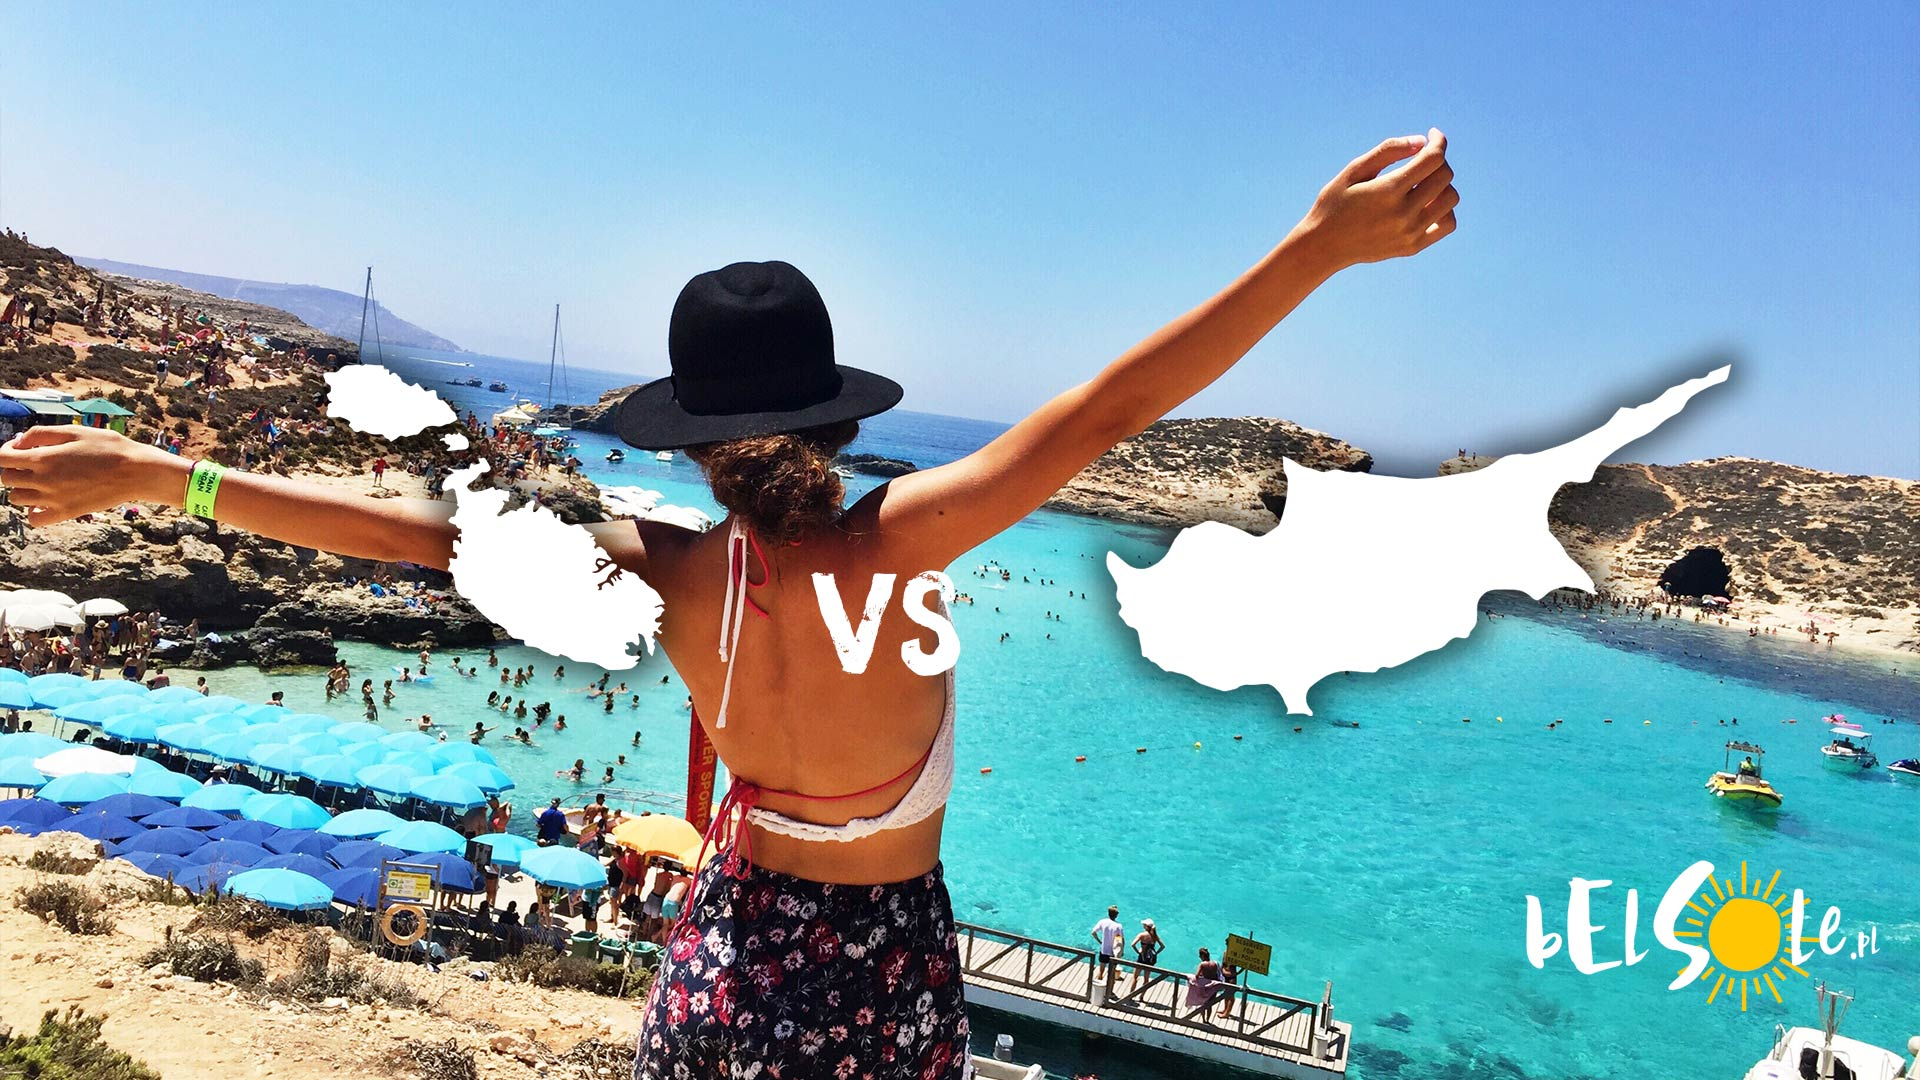 Cypr czy Malta